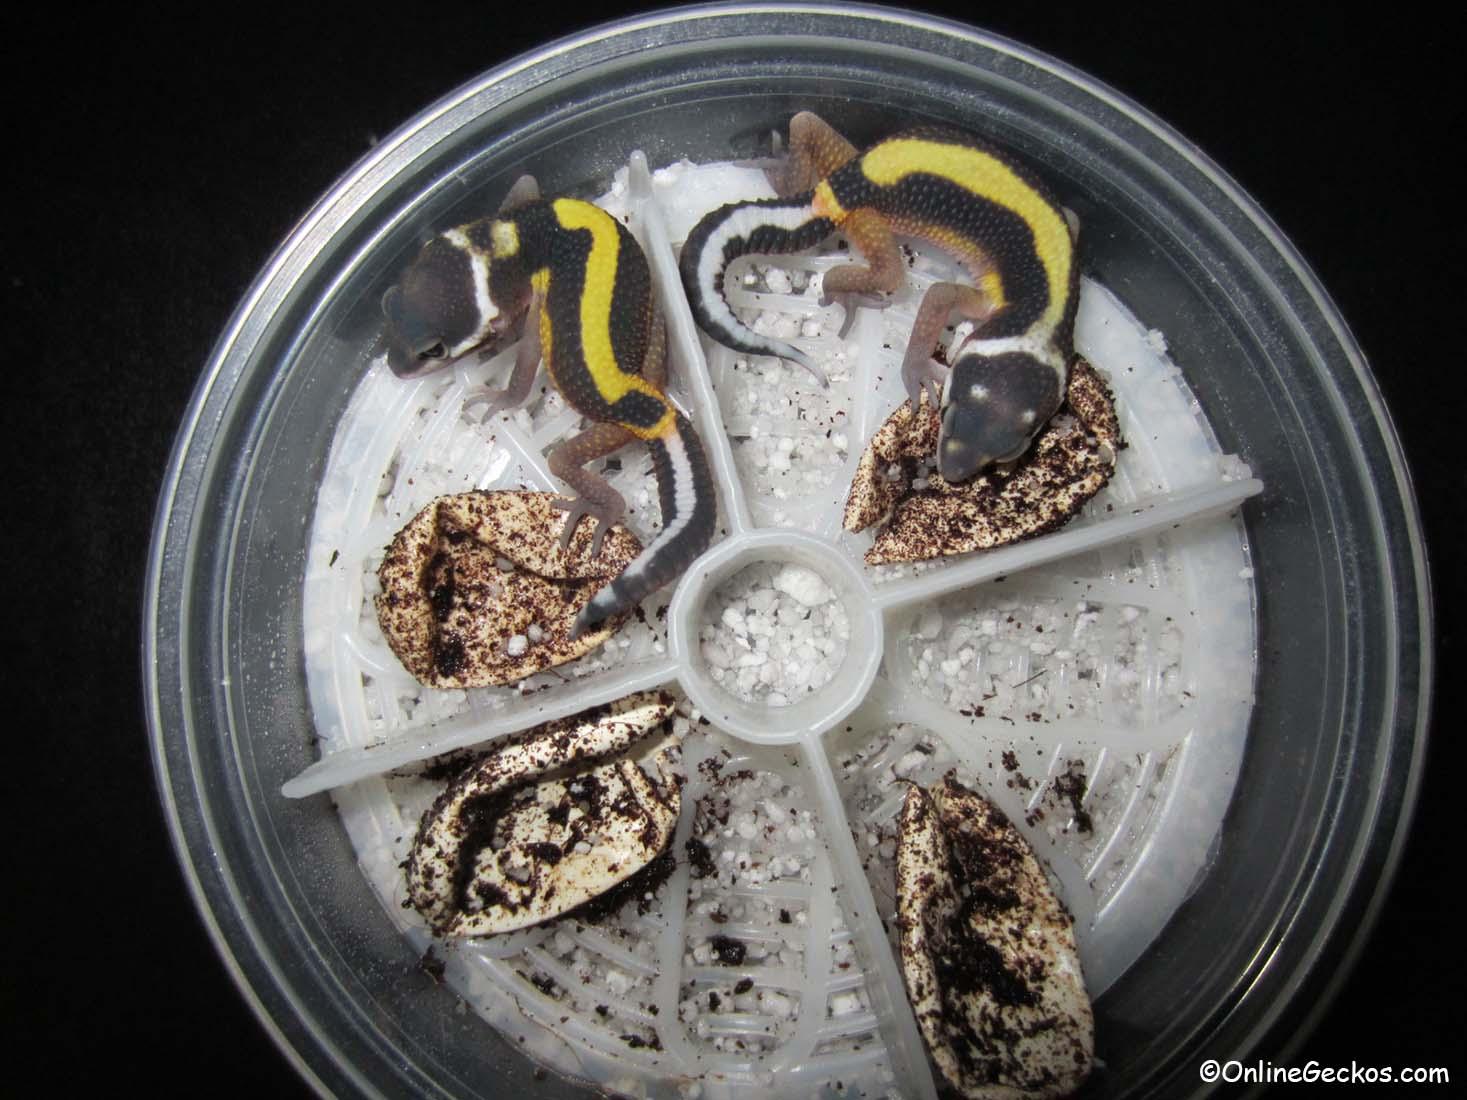 Best Reptile Incubator 2017 2018 Leopard Gecko Incubation